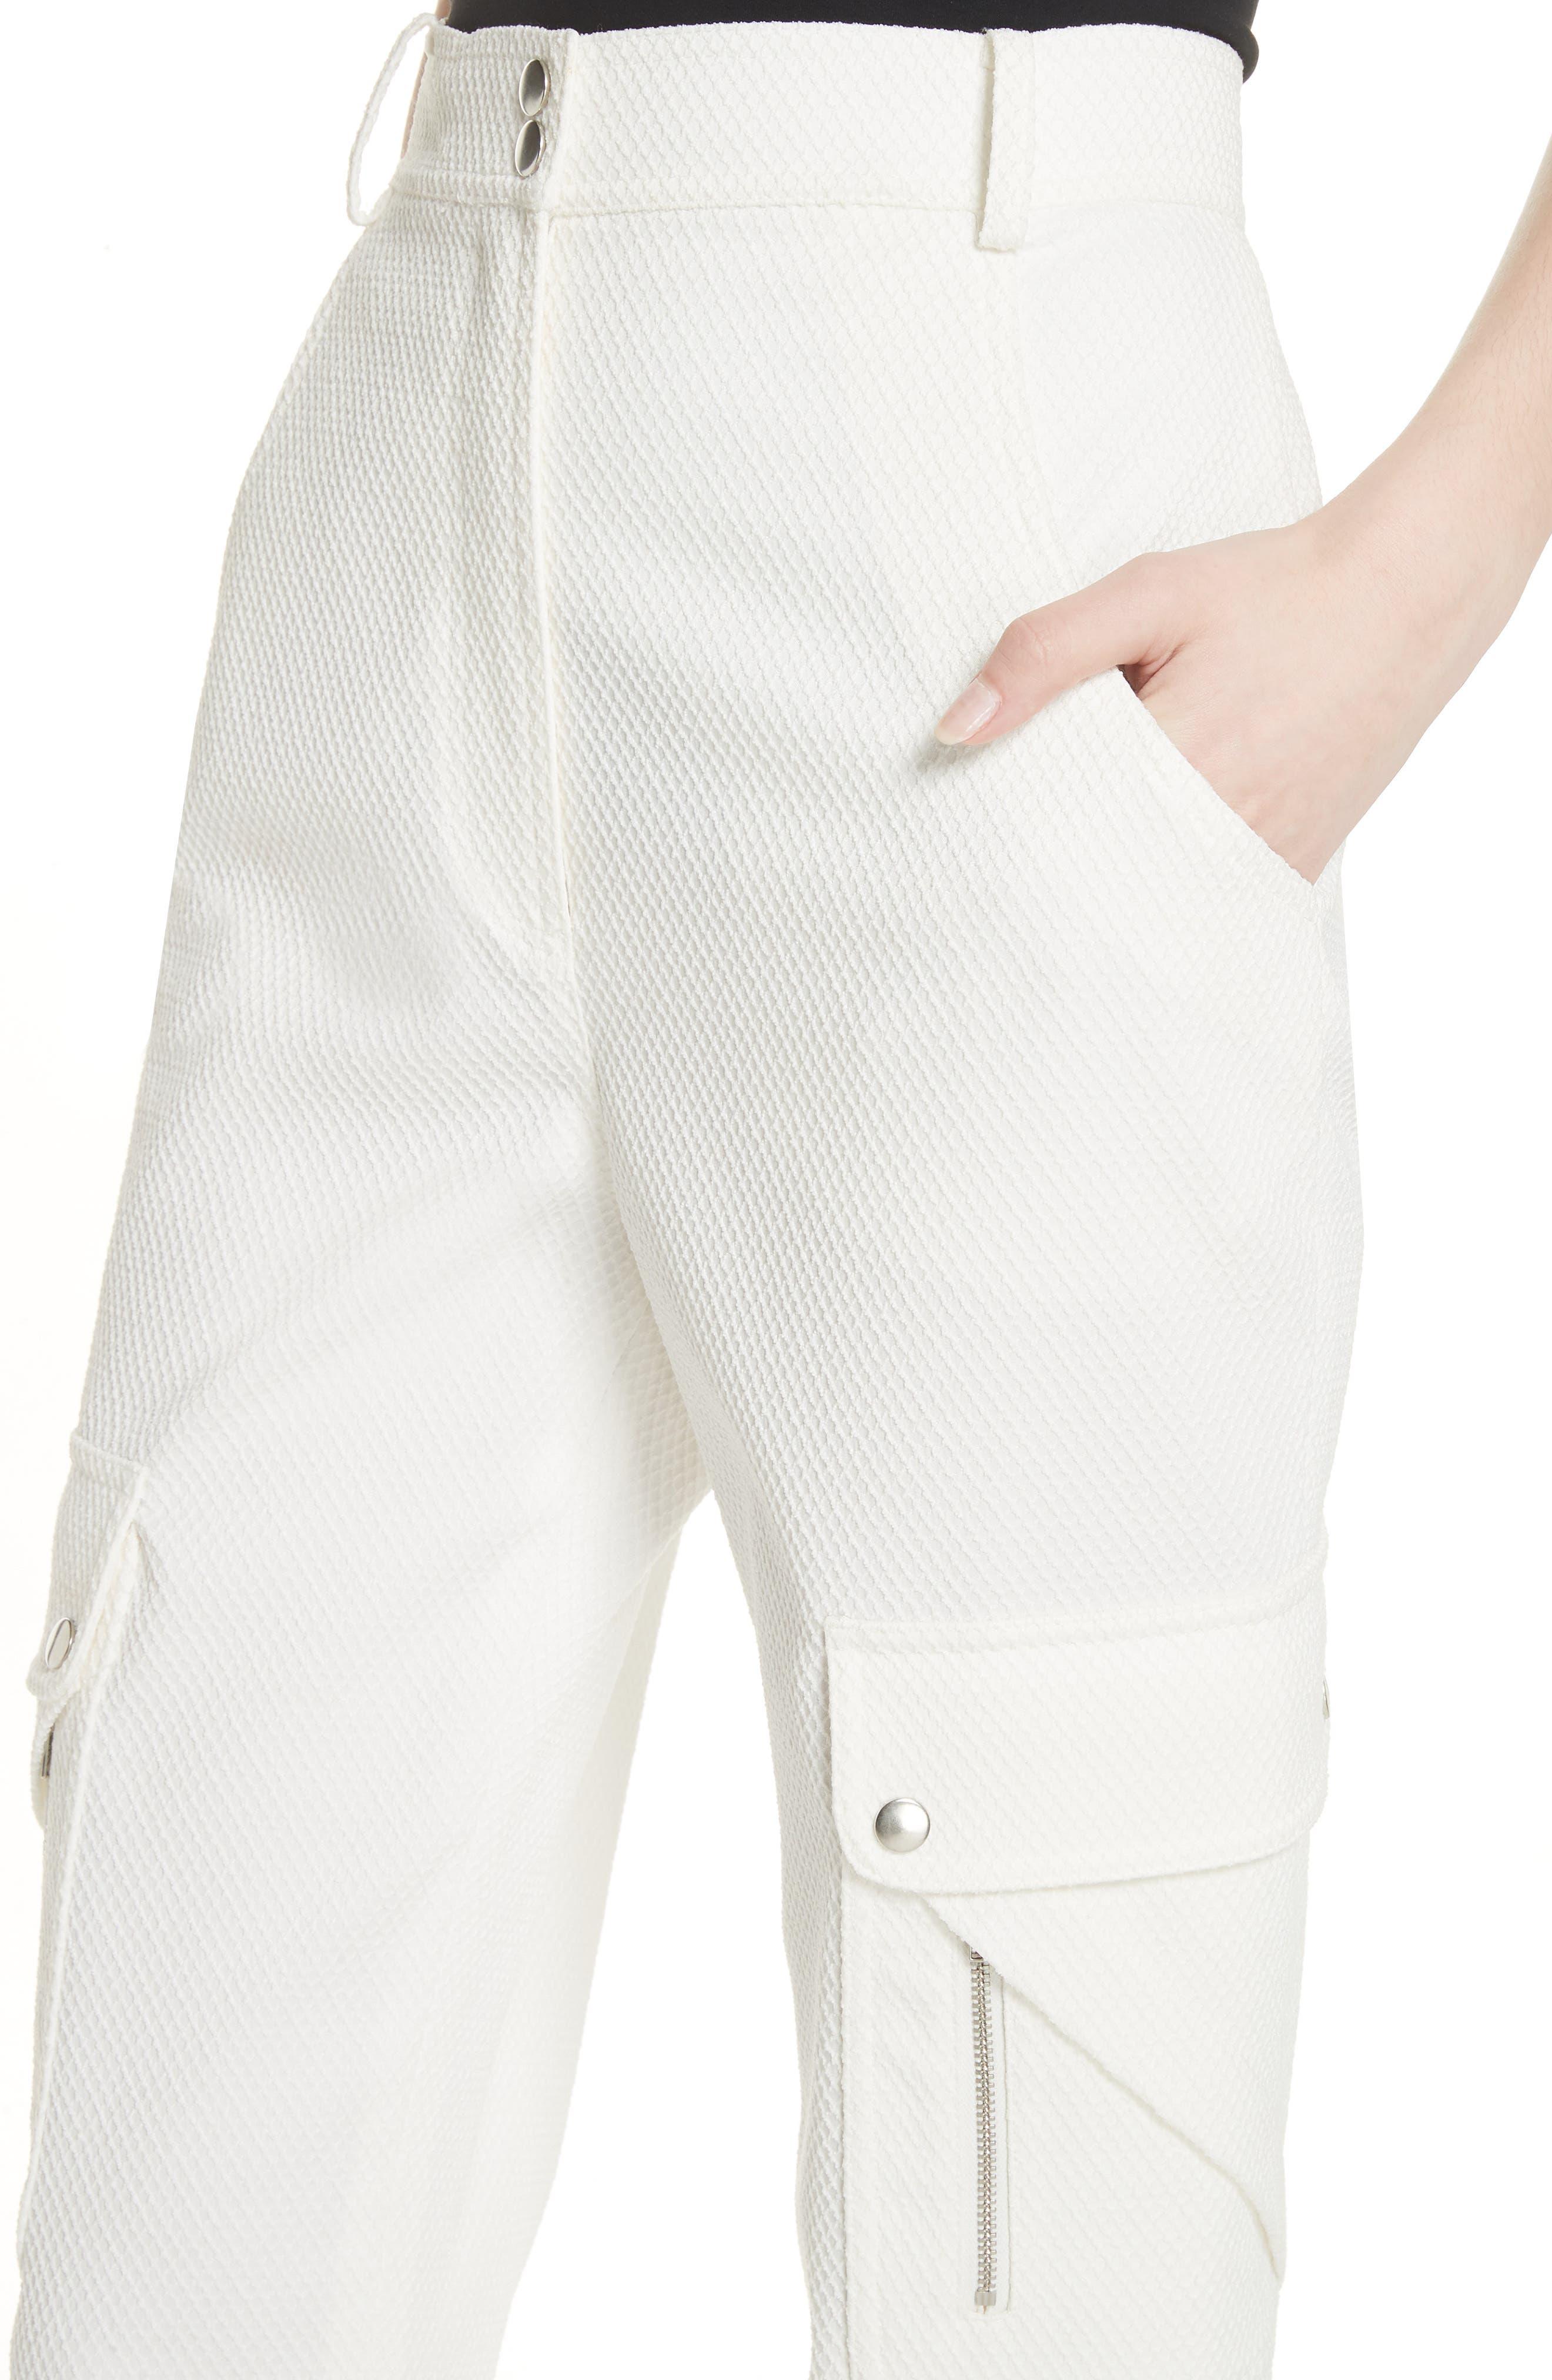 Textured Stretch Cotton Blend Utility Pants,                             Alternate thumbnail 4, color,                             116